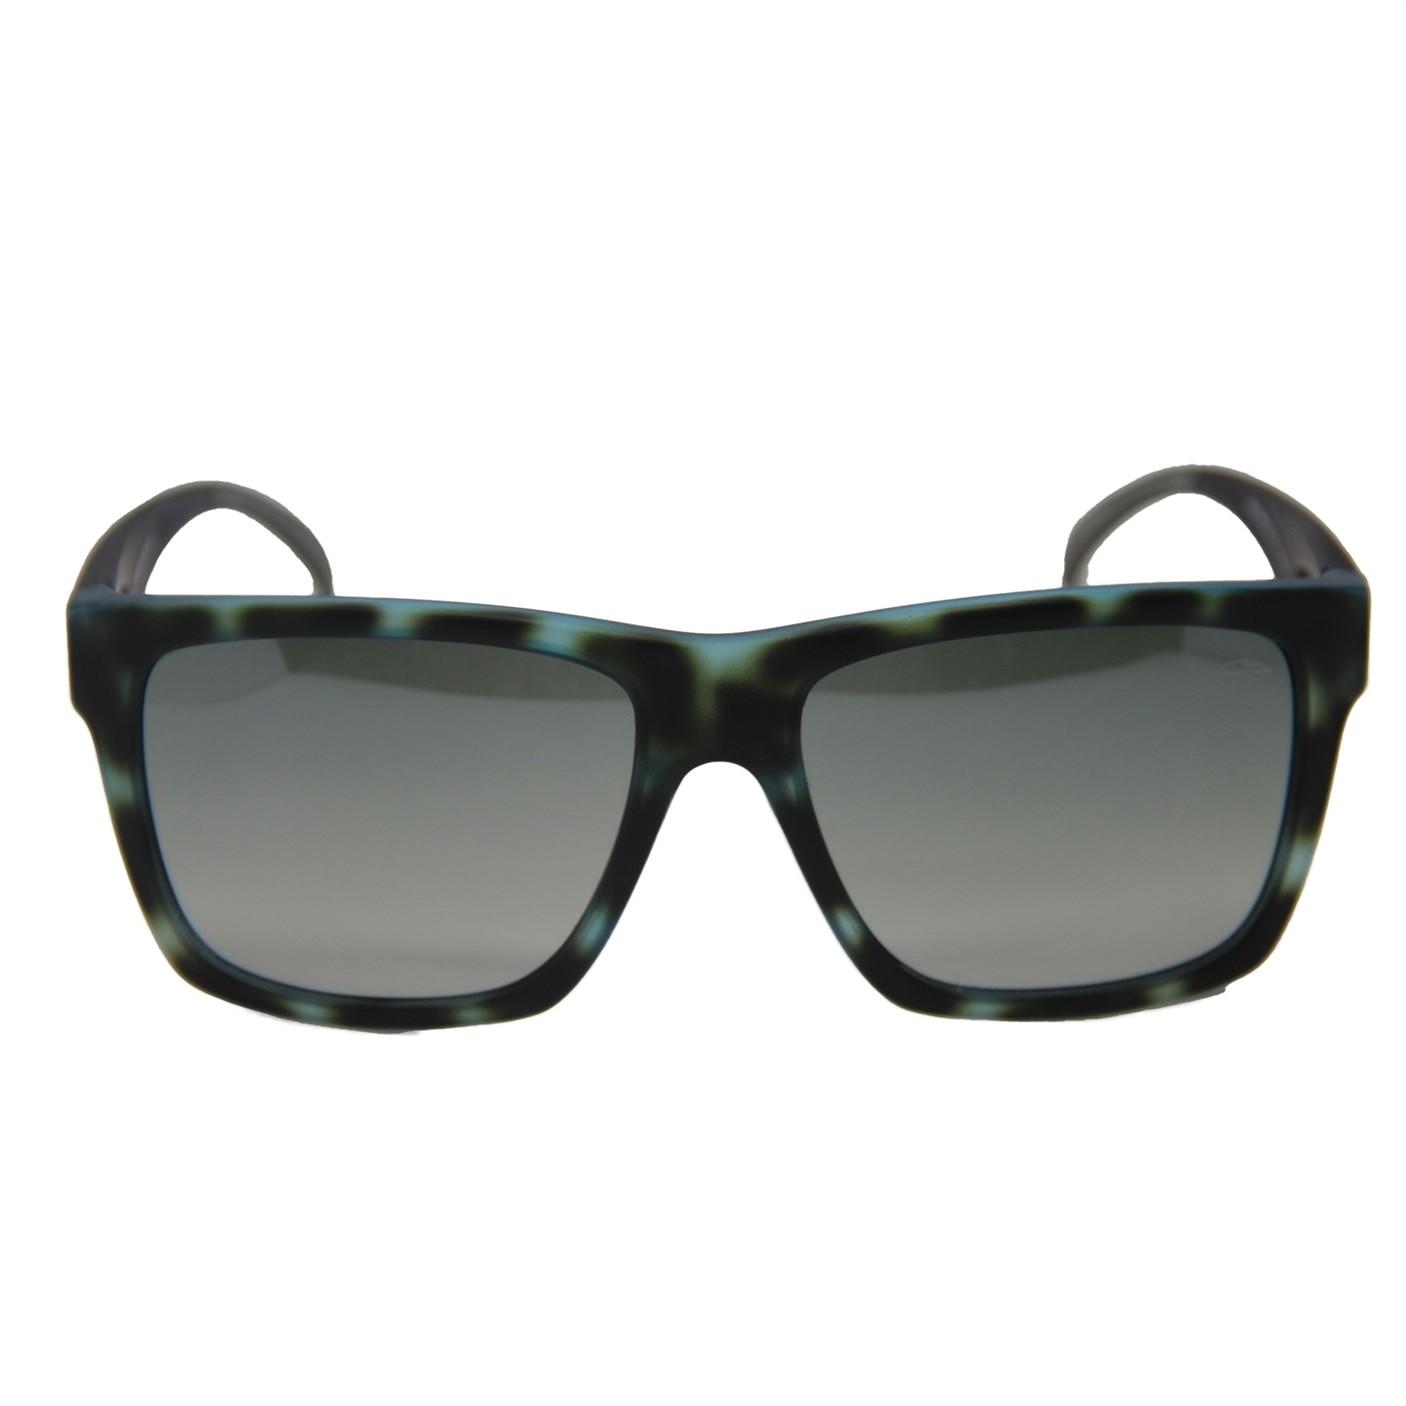 Oculos Solar Mormaii San Diego M0009f2043 Azul Tartaruga Lente Cinza Degrade